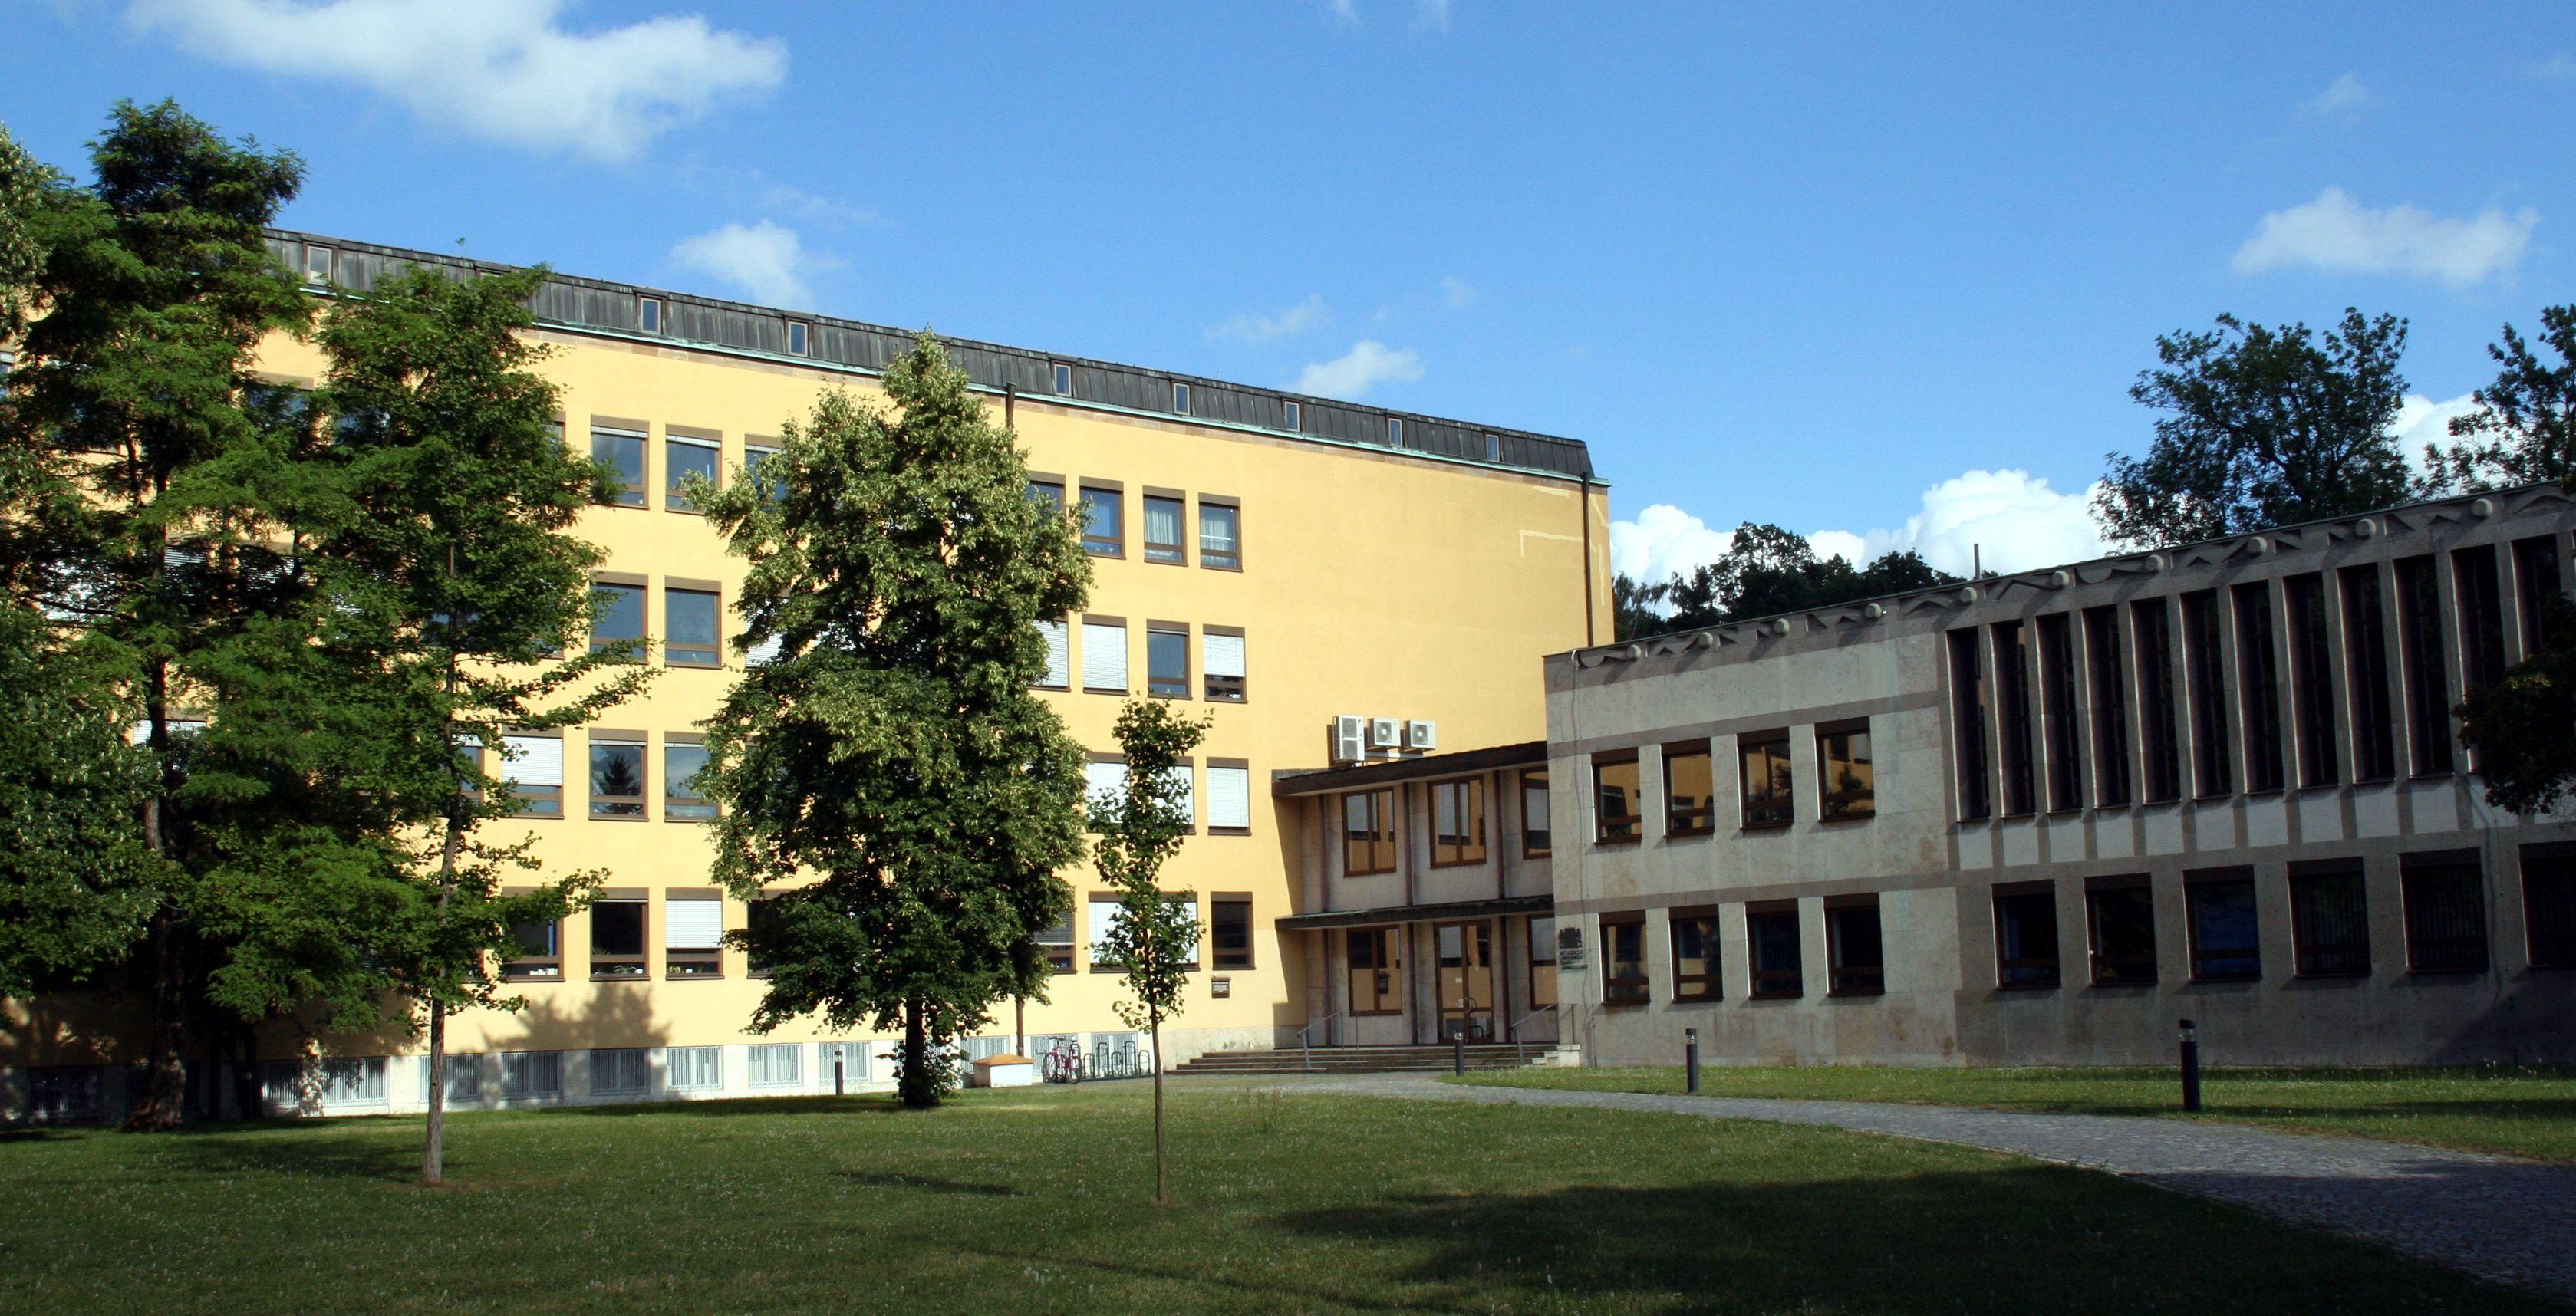 Amtsgericht Coburg Wikipedia